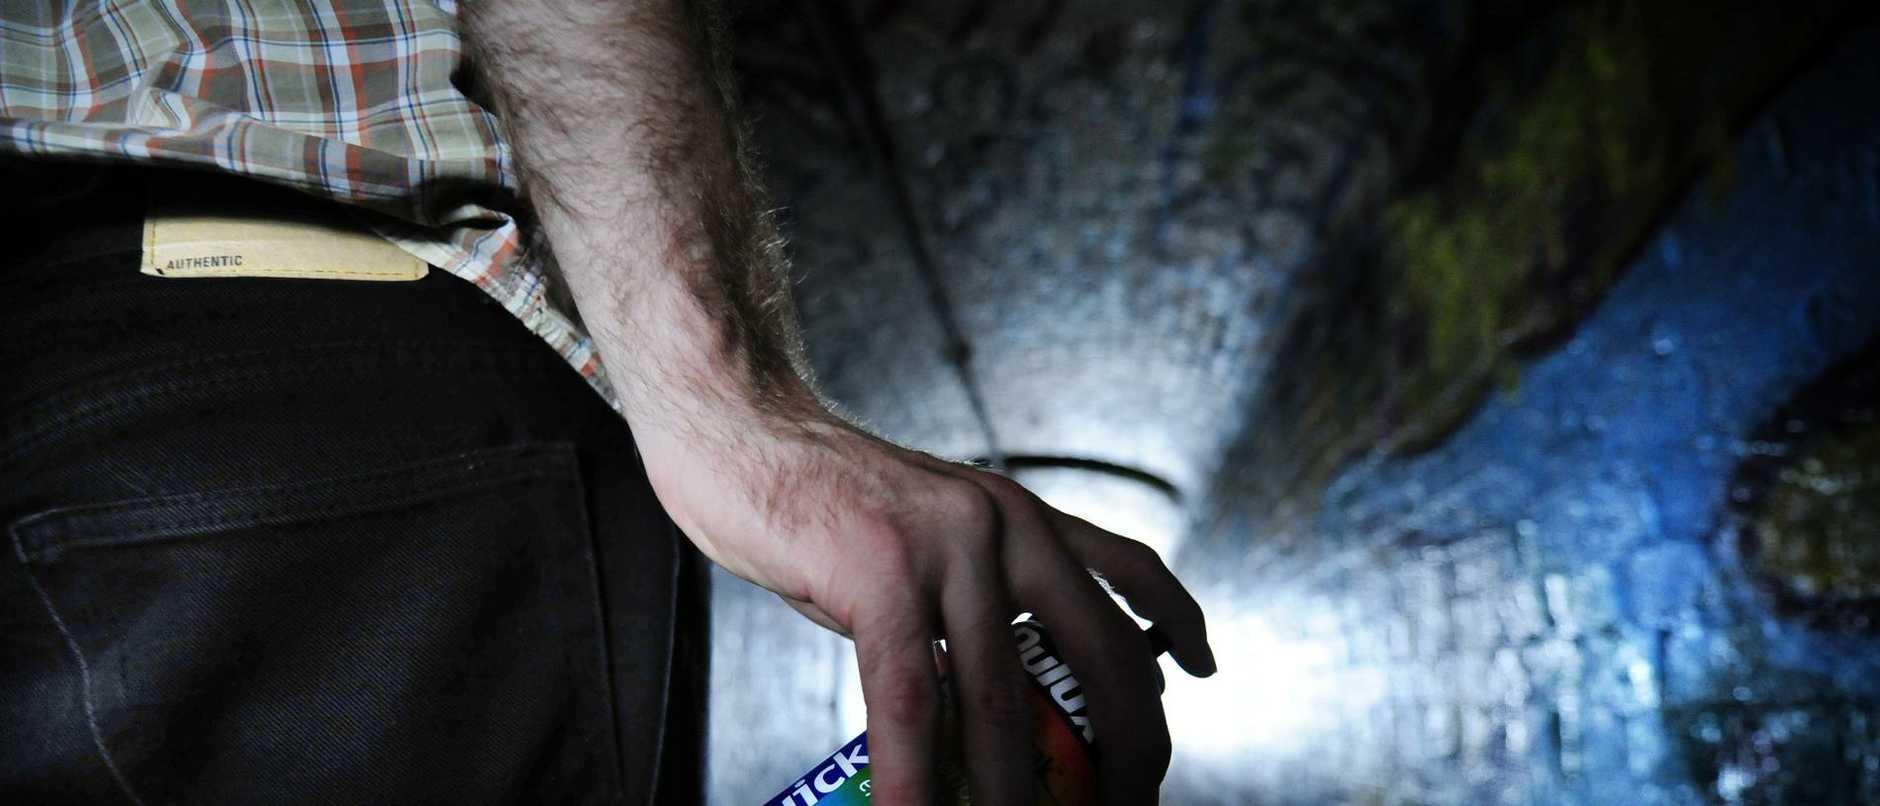 Graffiti Generic 3 November 08 Graffiti Generic Tunnel under rail at Enmore. Photo Phil Rogers